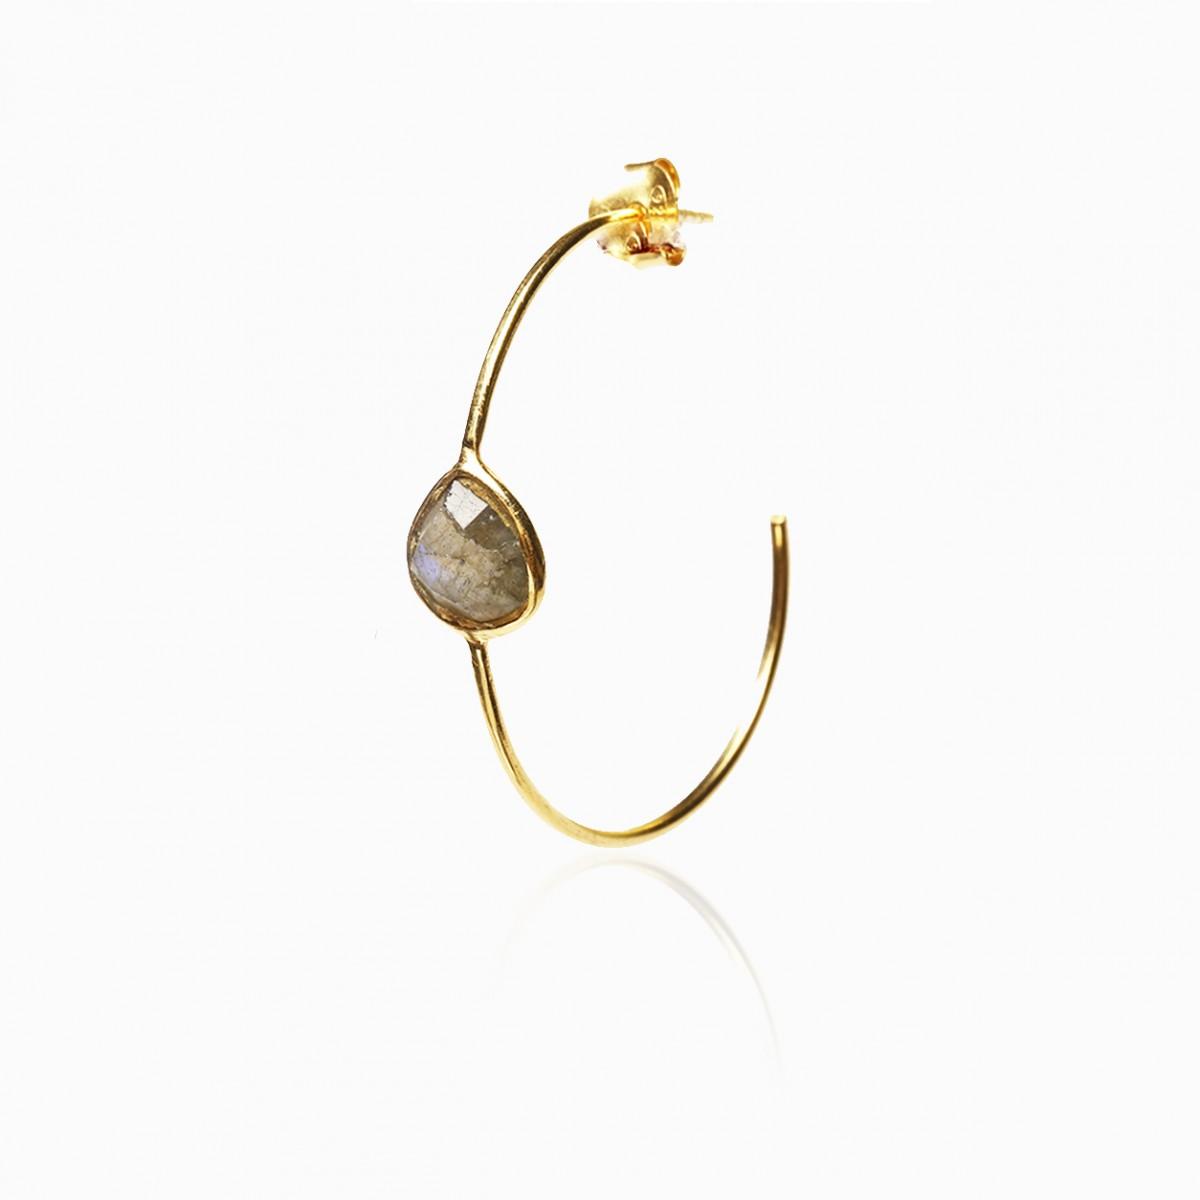 Labradorite semi-precious gemstone earrings